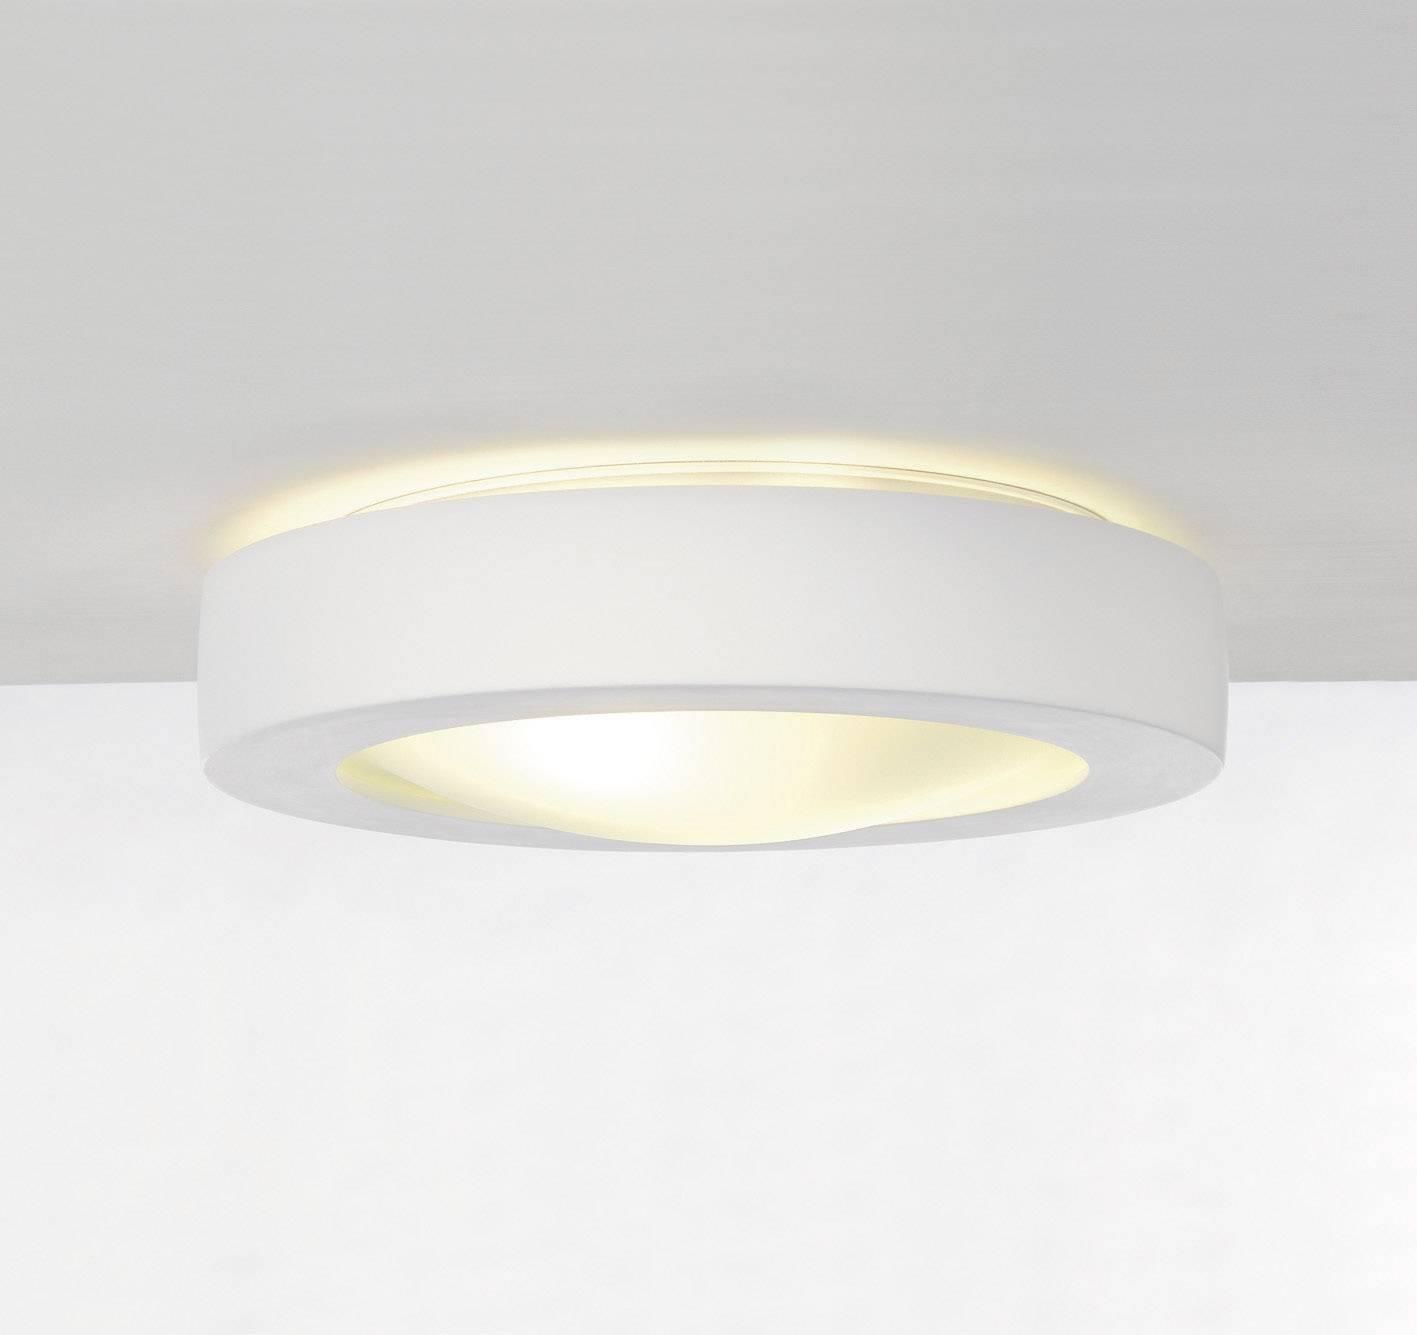 Stropní svítidlo úsporná žárovka SLV GL105 148001, E27, 50 W, bílá